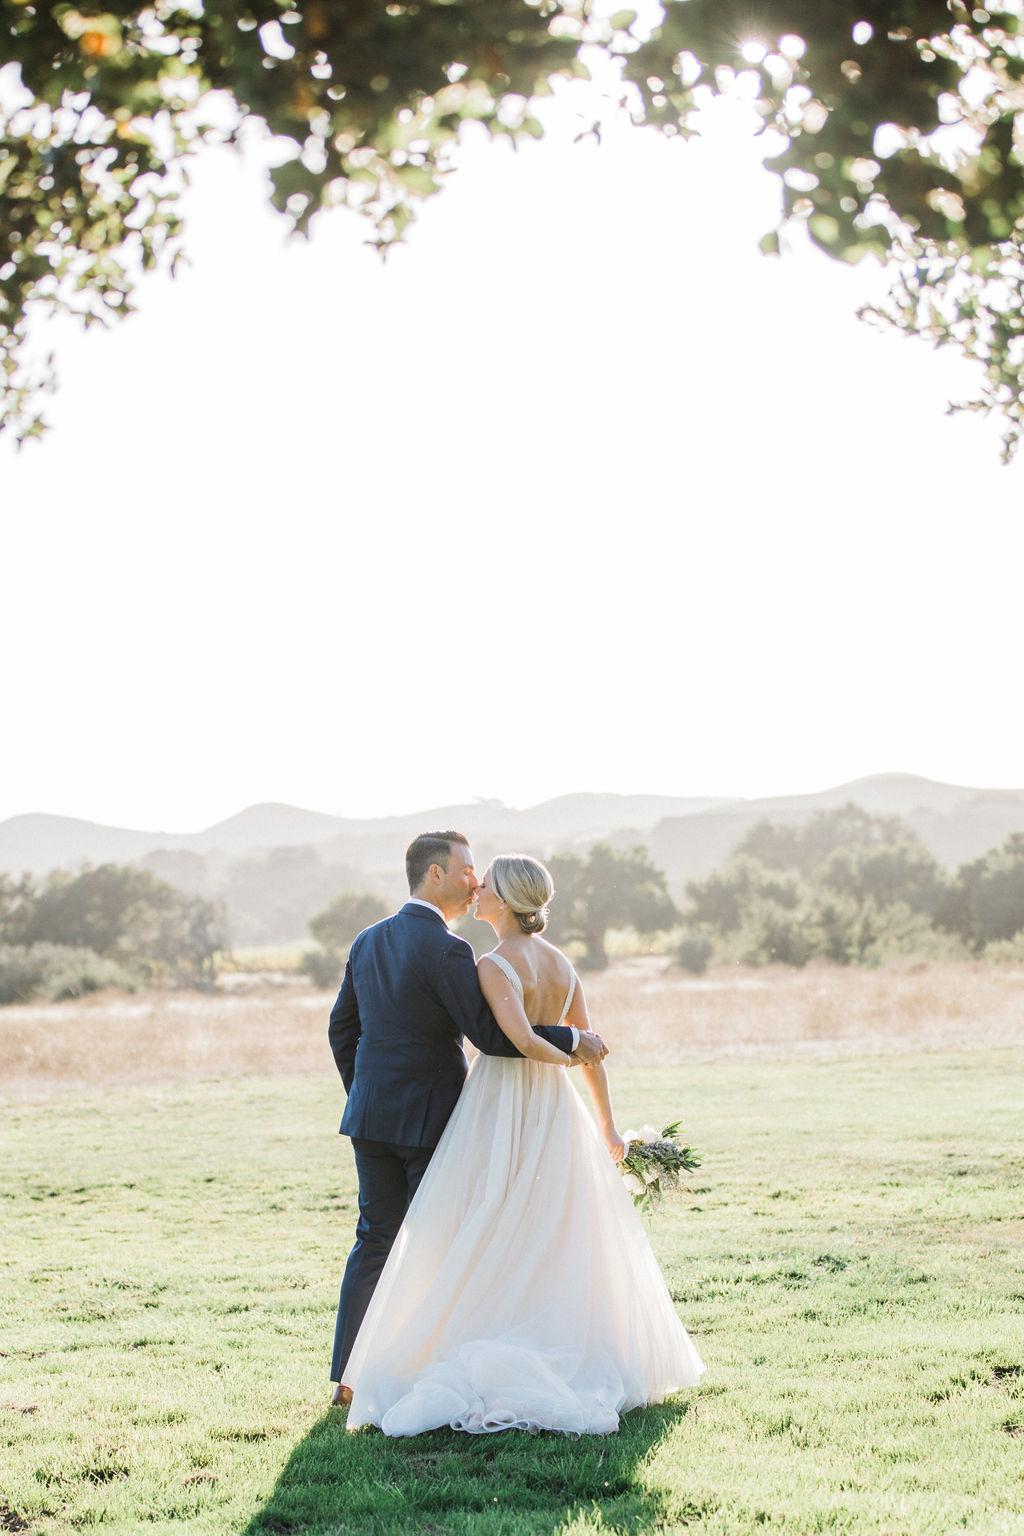 alegria-by-design-wedding-planner-planning-event-design-coordinator-day-of-month-crossroads-estate-garden-vineyard-firestone-barn-location-rustic-santa-barbara (1 (14).JPG